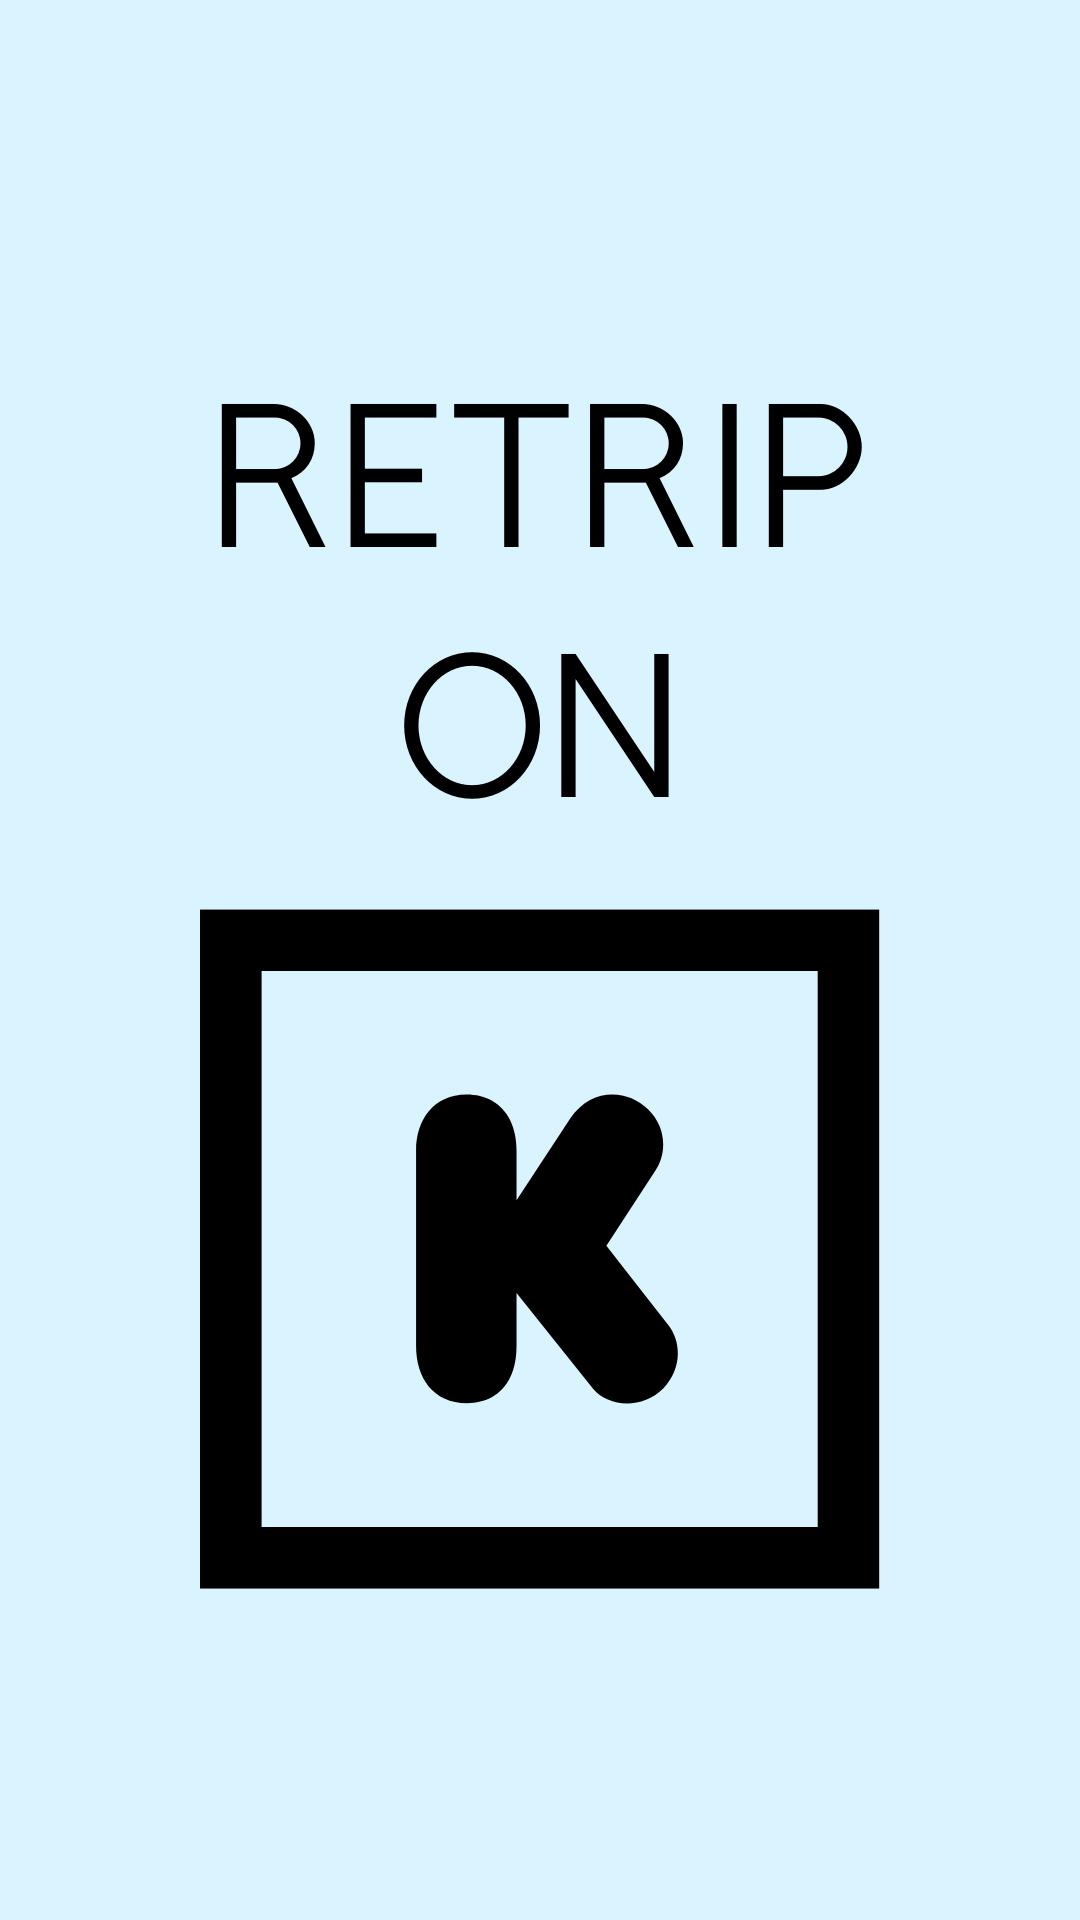 Retrip on kickstarter (2)